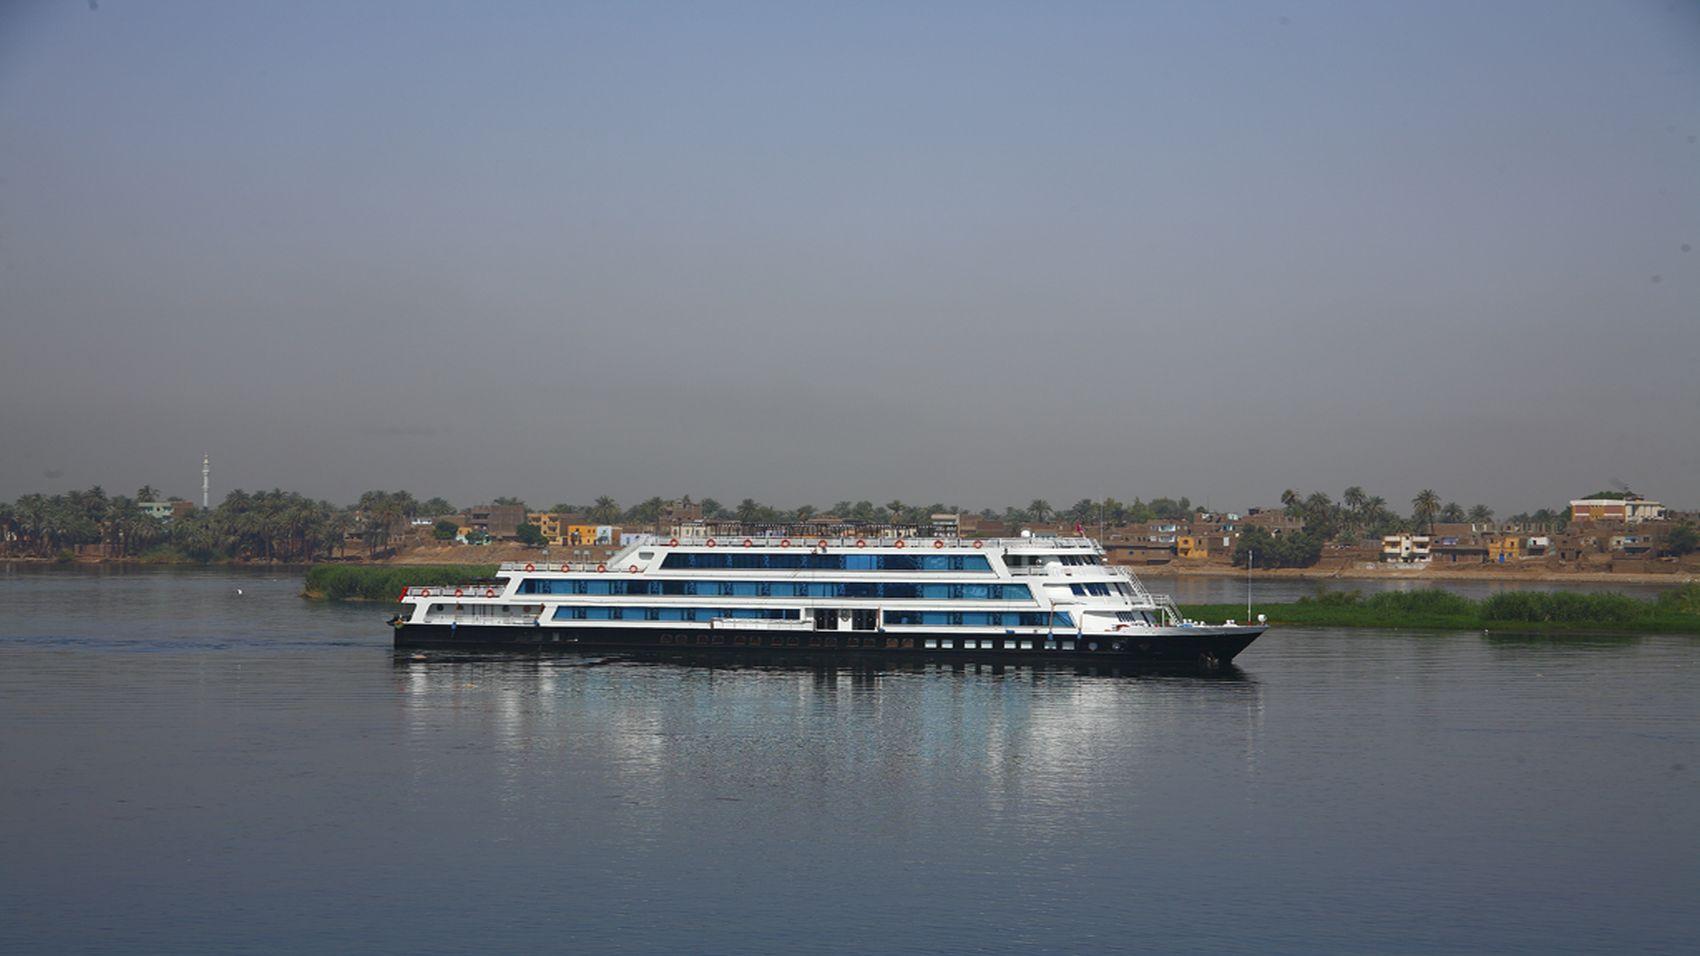 Darakum Nile Cruise Exterior 1